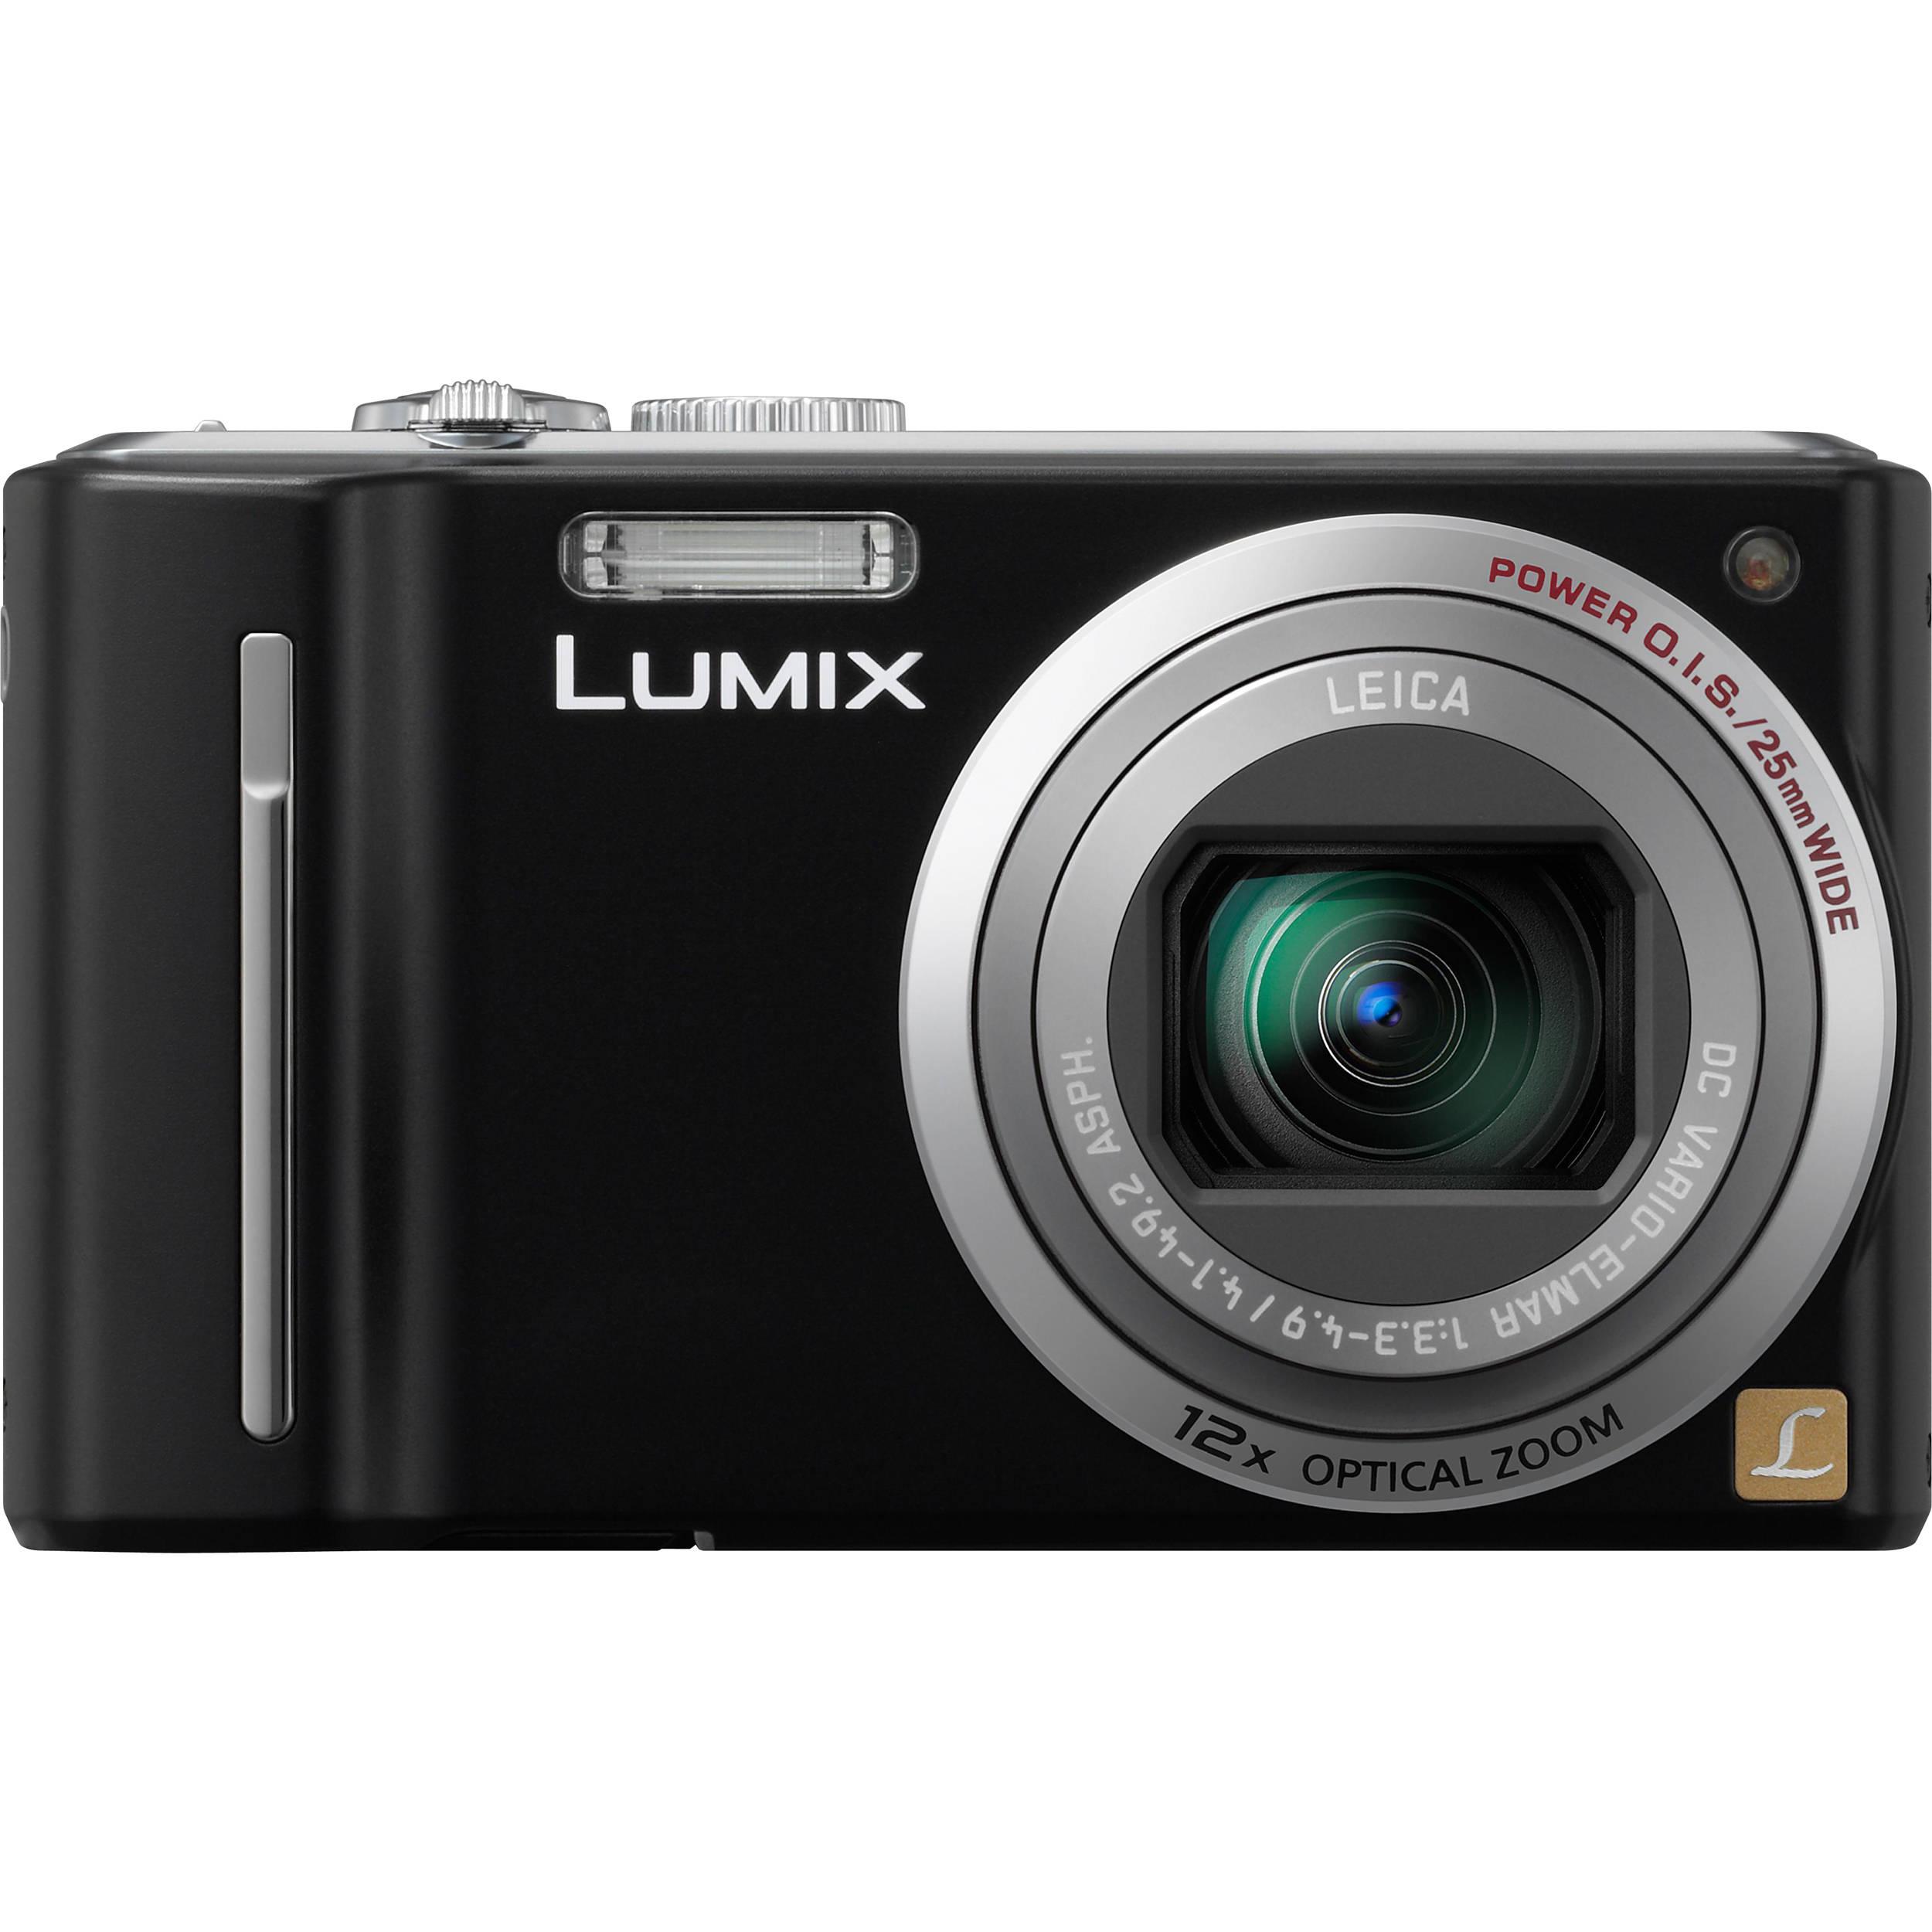 Panasonic LUMIX DMC-ZS5 Digital Camera (Black)